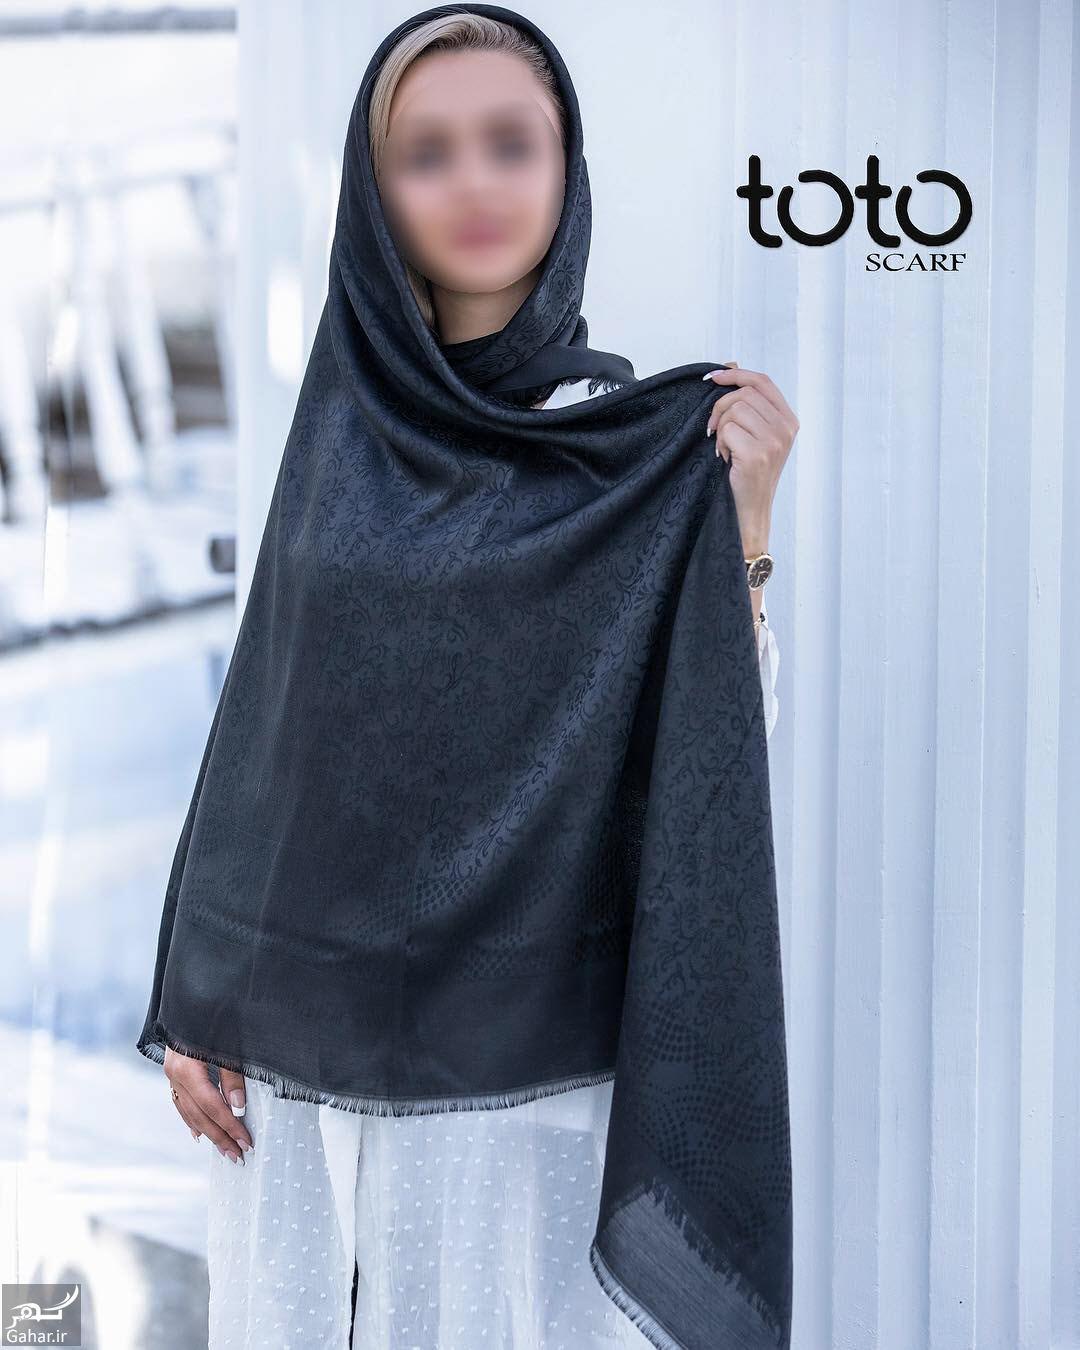 402979 Gahar ir جدیدترین مدل های شال و روسری از برند ایرانی توتو